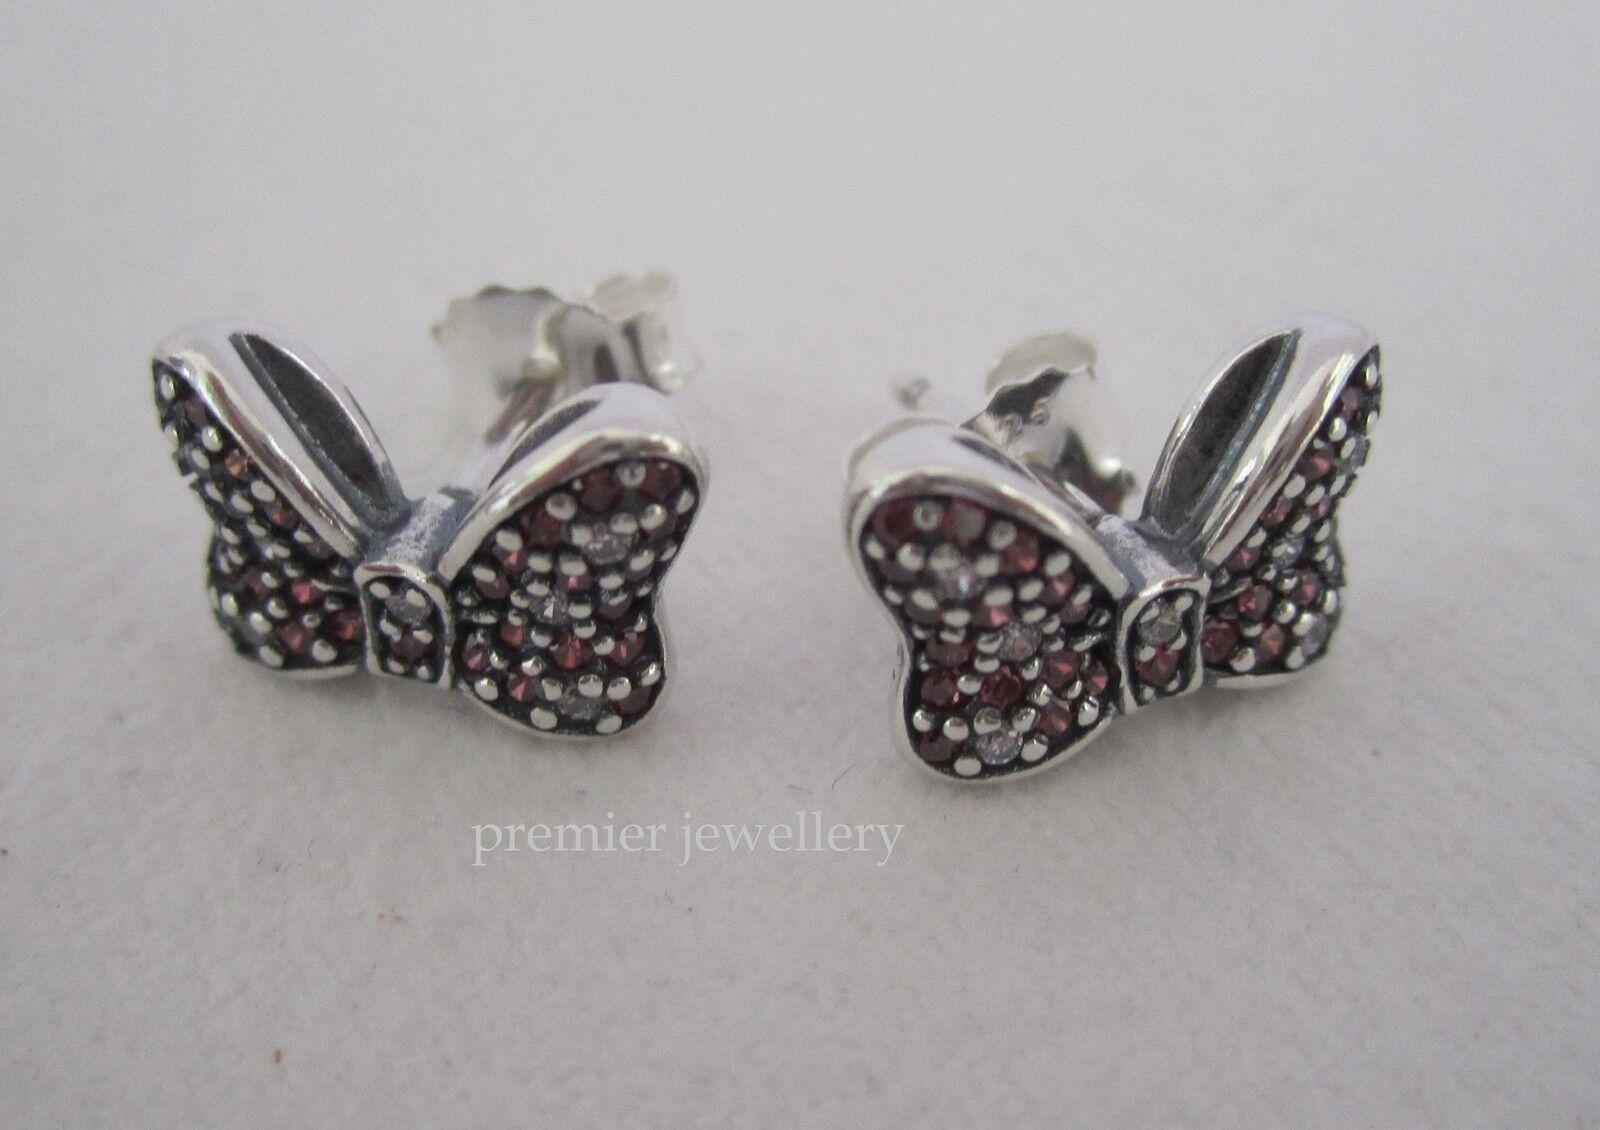 3398dc0f1 Genuine PANDORA Disney Sparkling Minnie Bow Silver Stud Charm ...